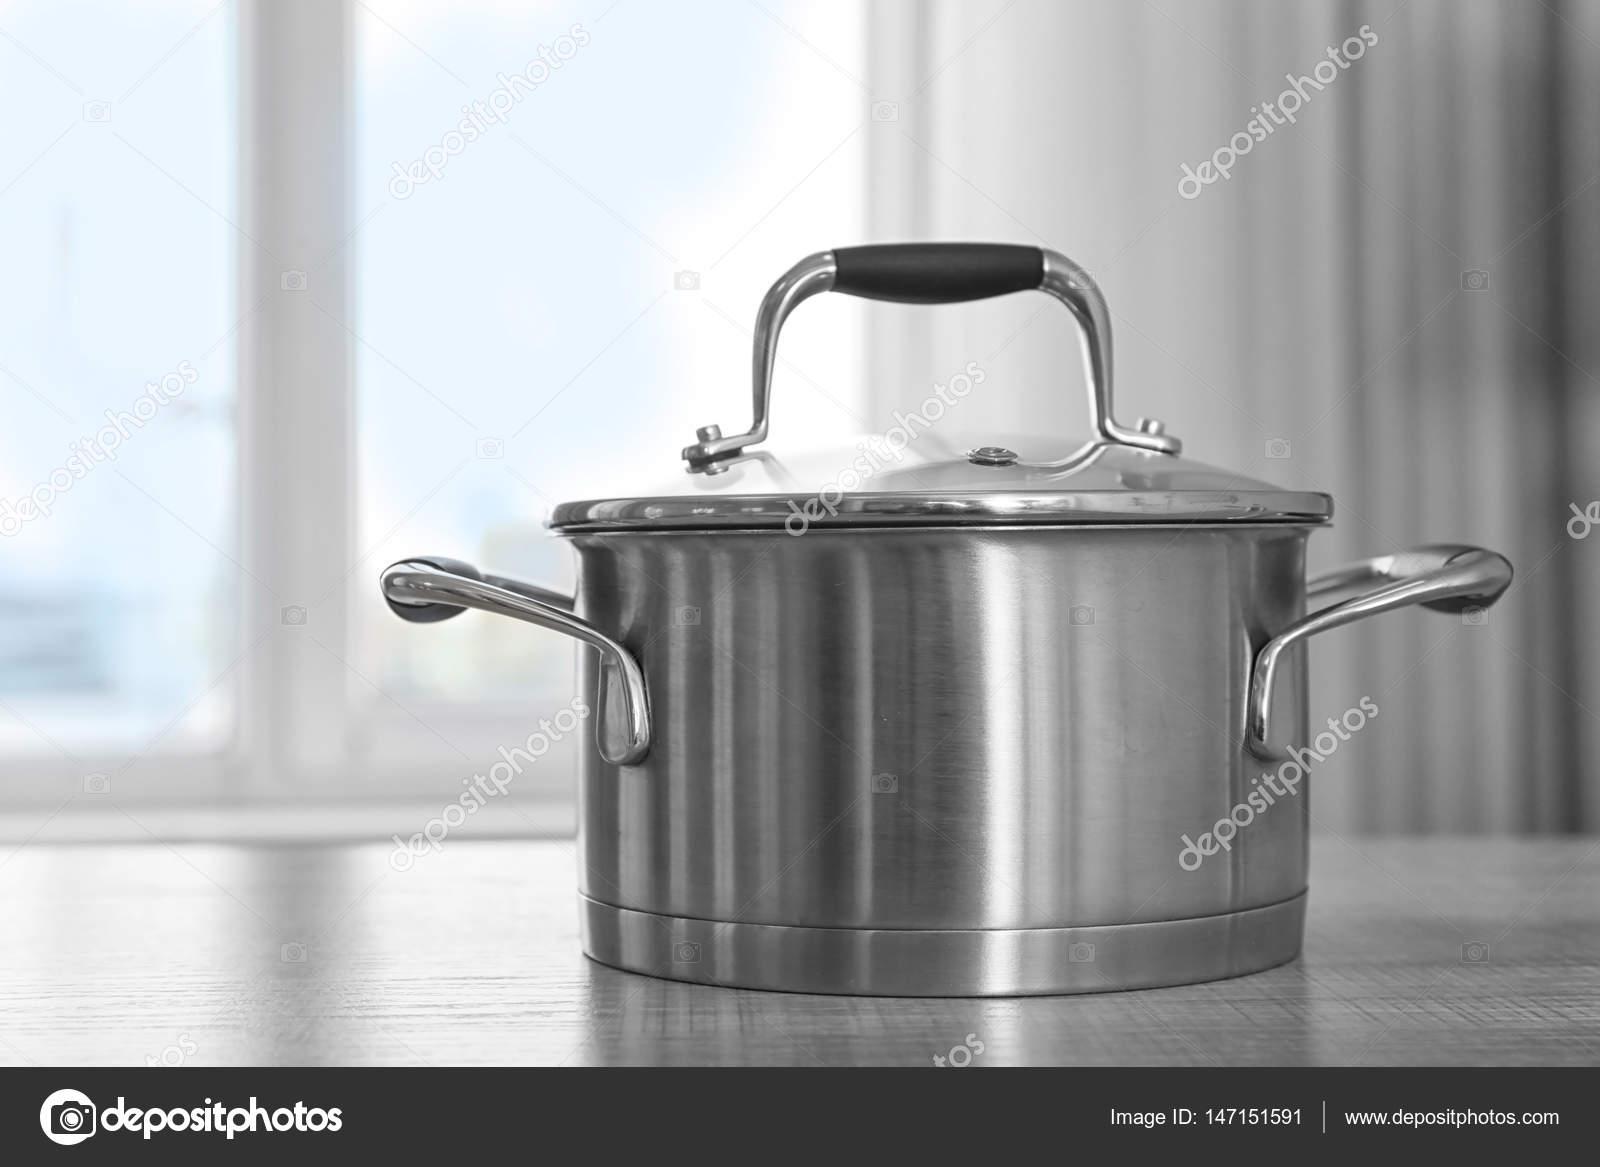 metal kitchen tables alder cabinets 桌上的金属平底锅 图库照片 c belchonock 147151591 在厨房桌子上的金属平底锅 照片作者belchonock